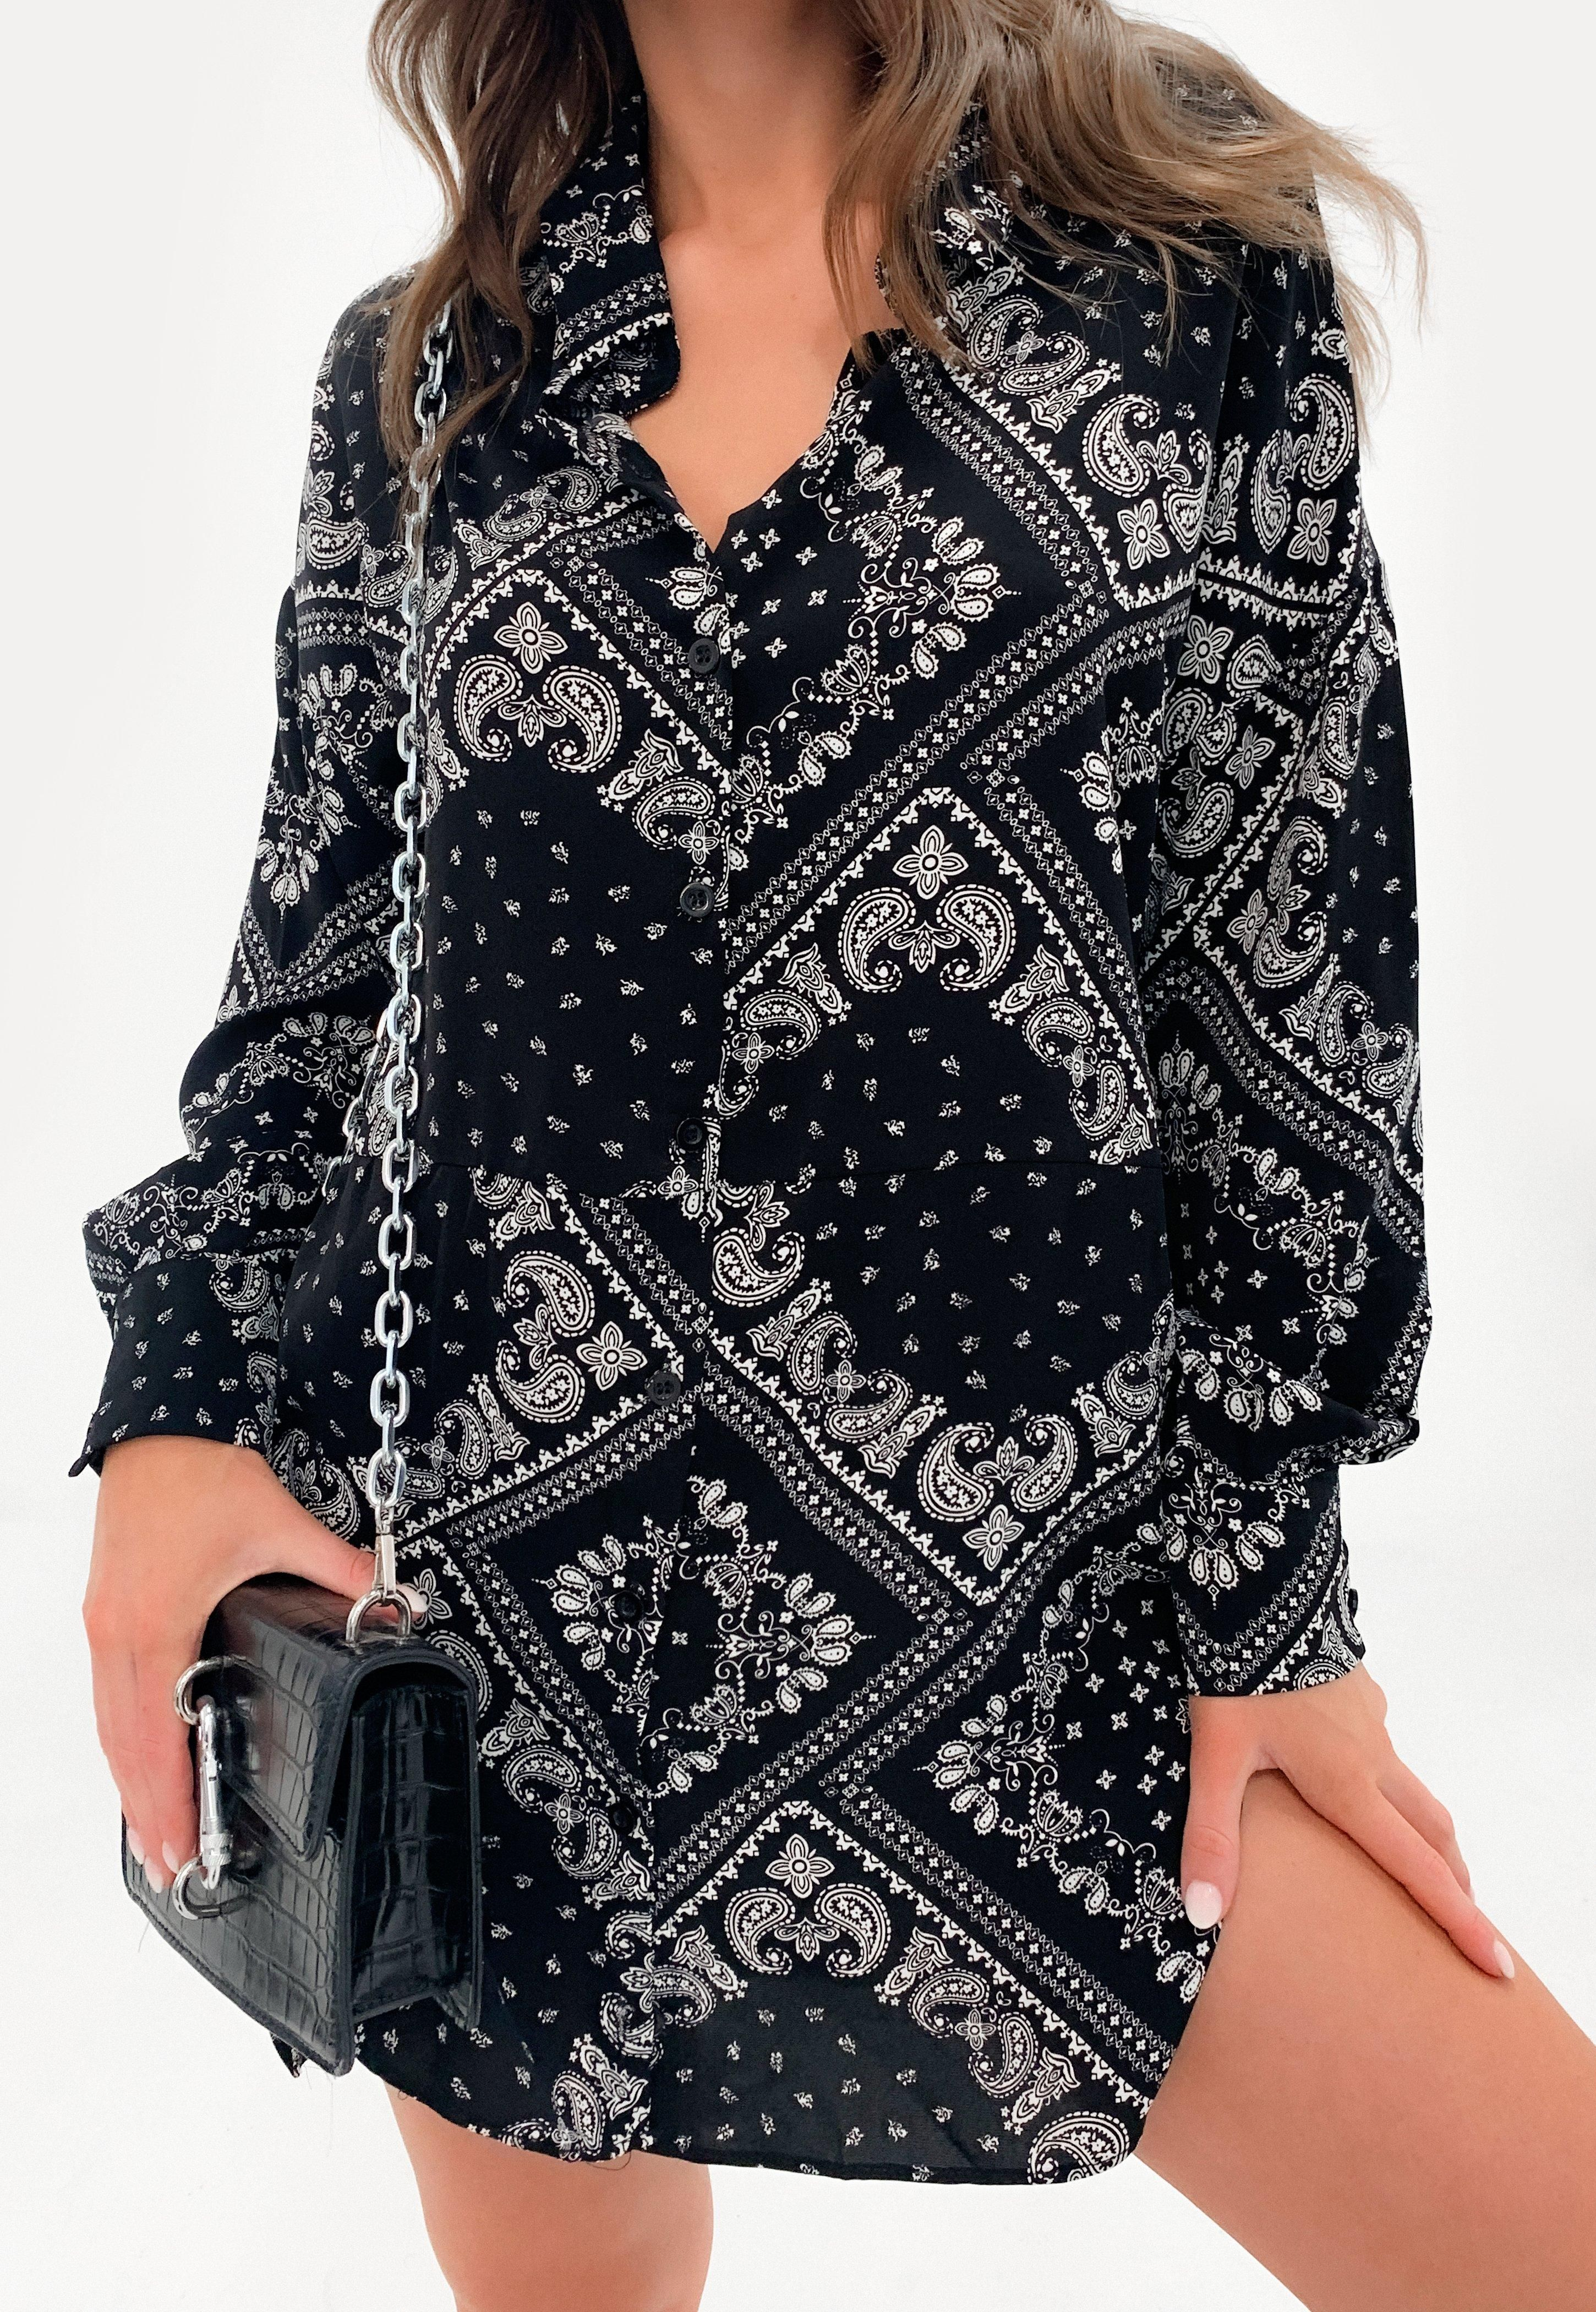 Missguided Black Bandana Print Oversized Dip Back Shirt Dress Bandana Print Dress Shirt Sleeves Long Sleeve Shirt Dress [ 4200 x 2900 Pixel ]